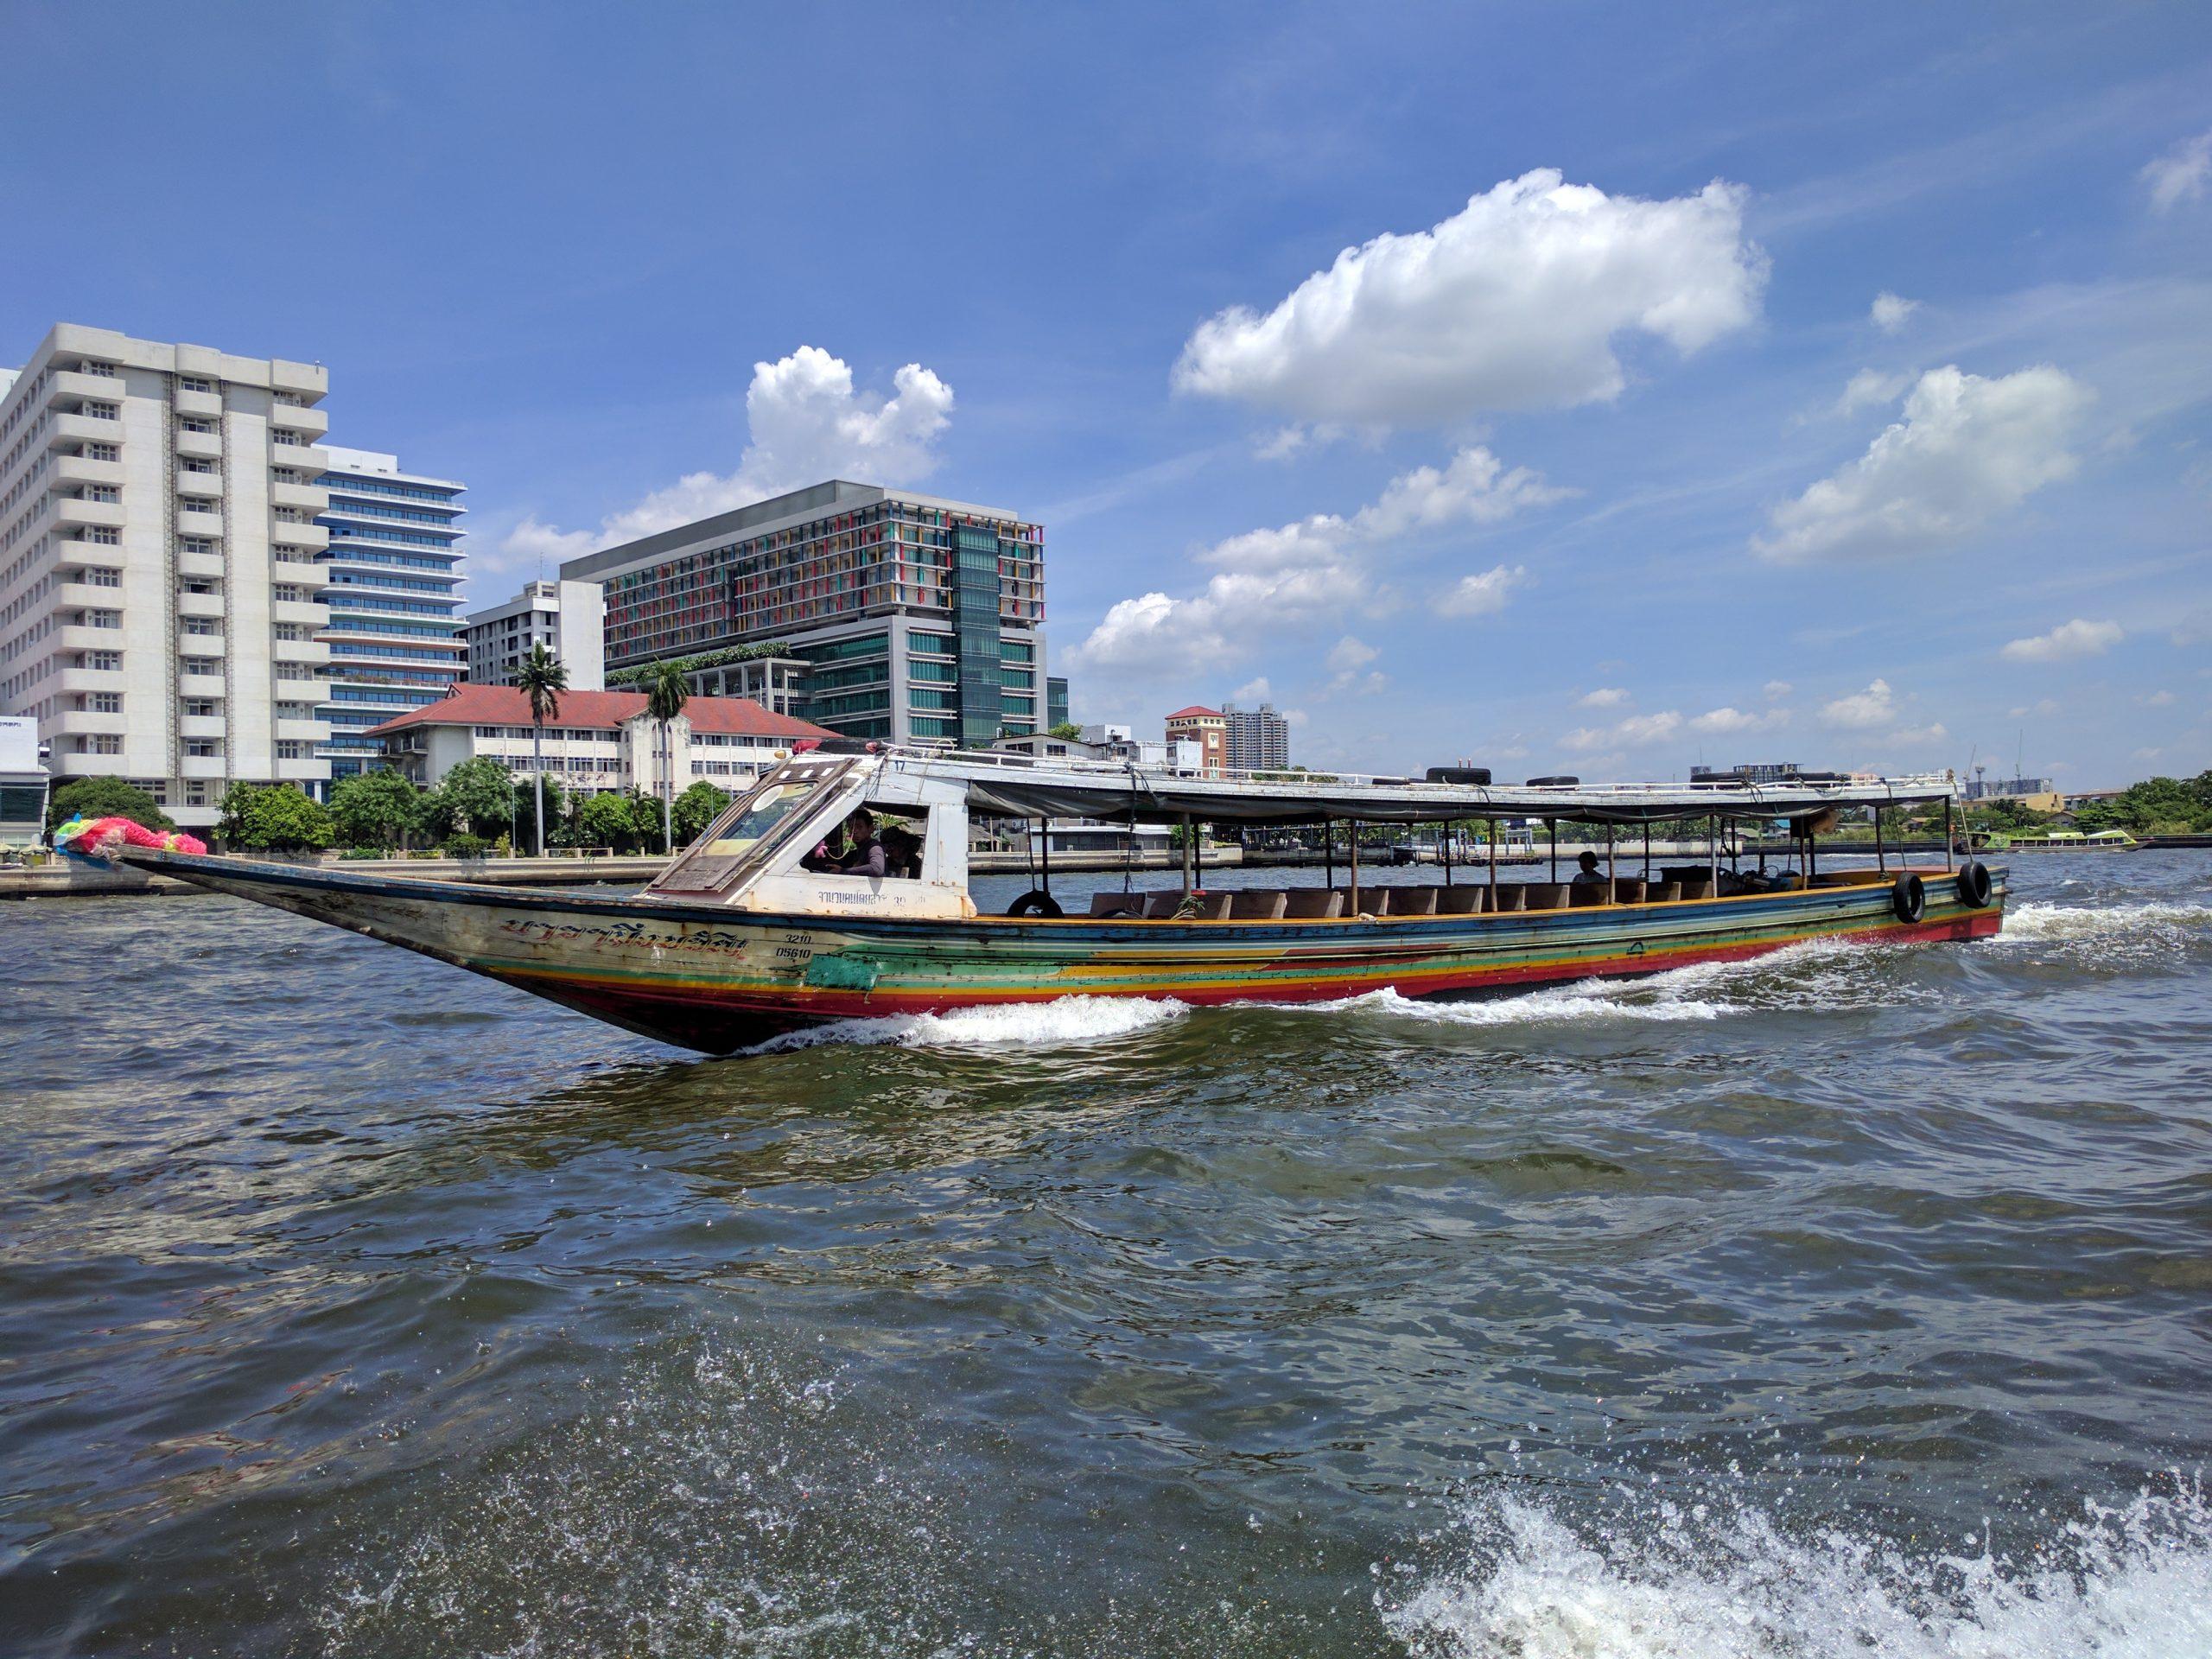 Top Place to Visit in Bangkok-Chao Phraya River